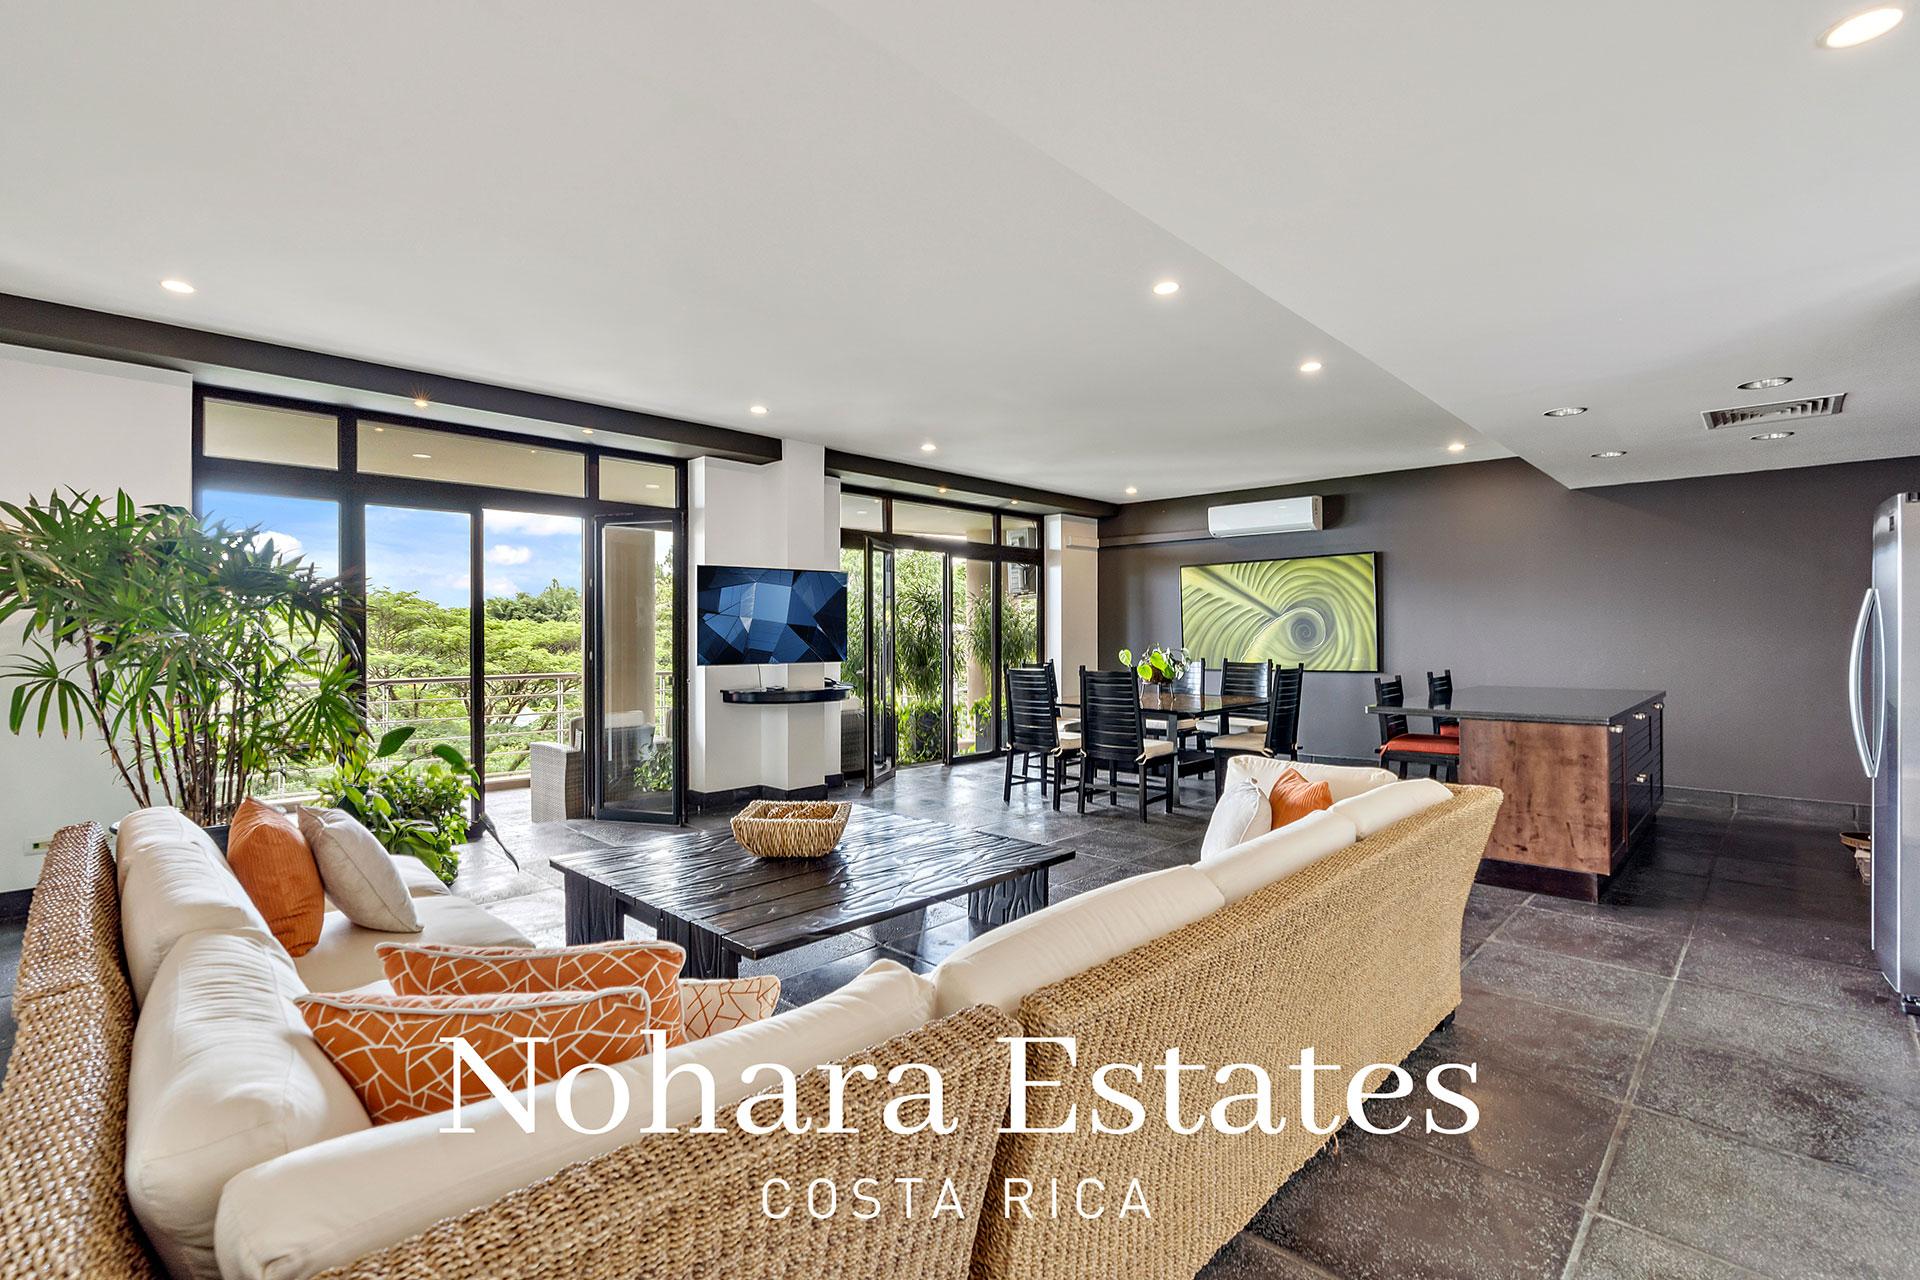 Nohara Estates Costa Rica 125 Apartment Quepos Los Altos 8